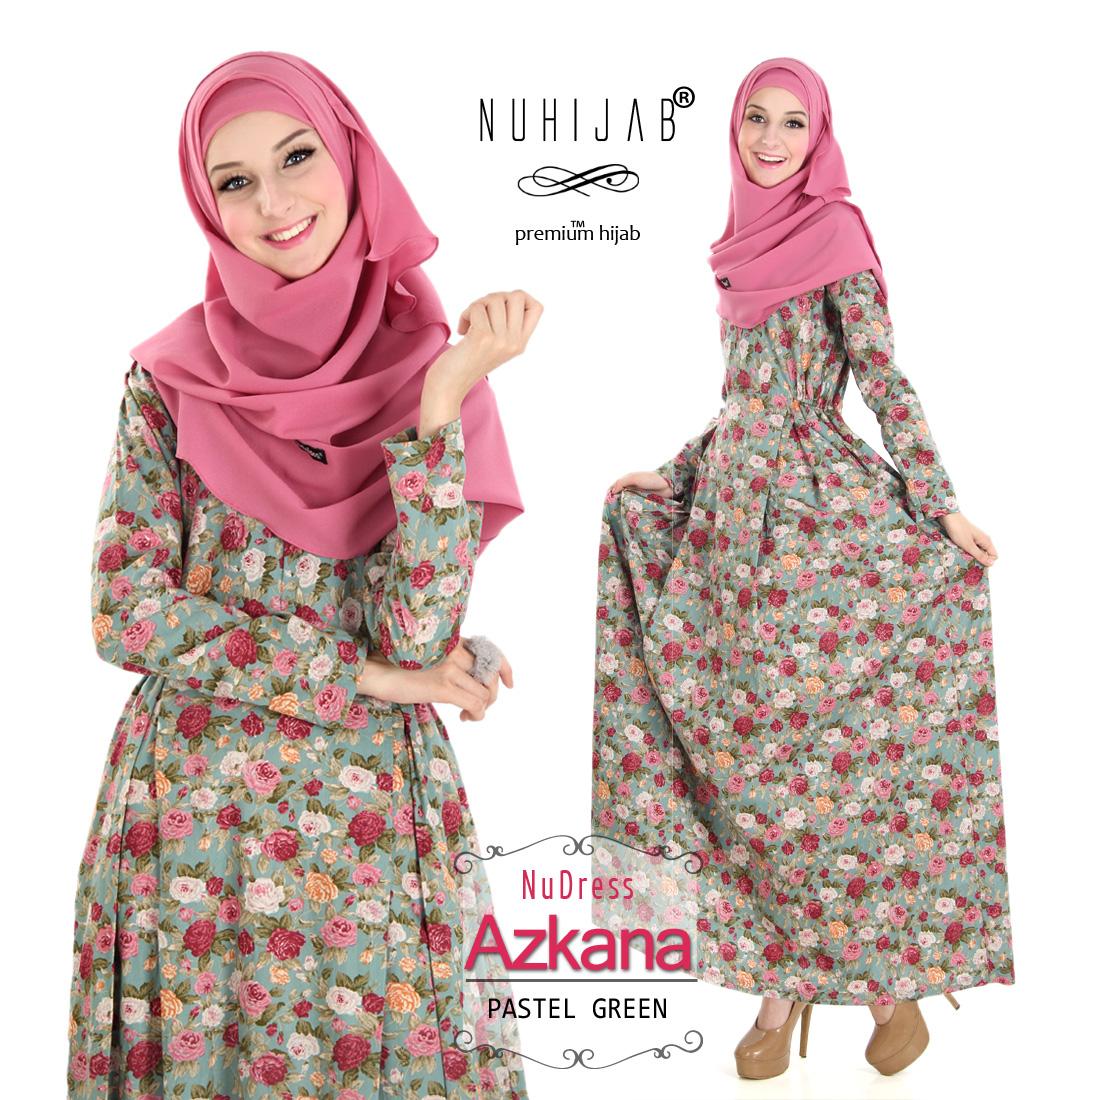 Baju Muslim Terbaru 2017 Online Nuhijab Gamis NuDress Azkana